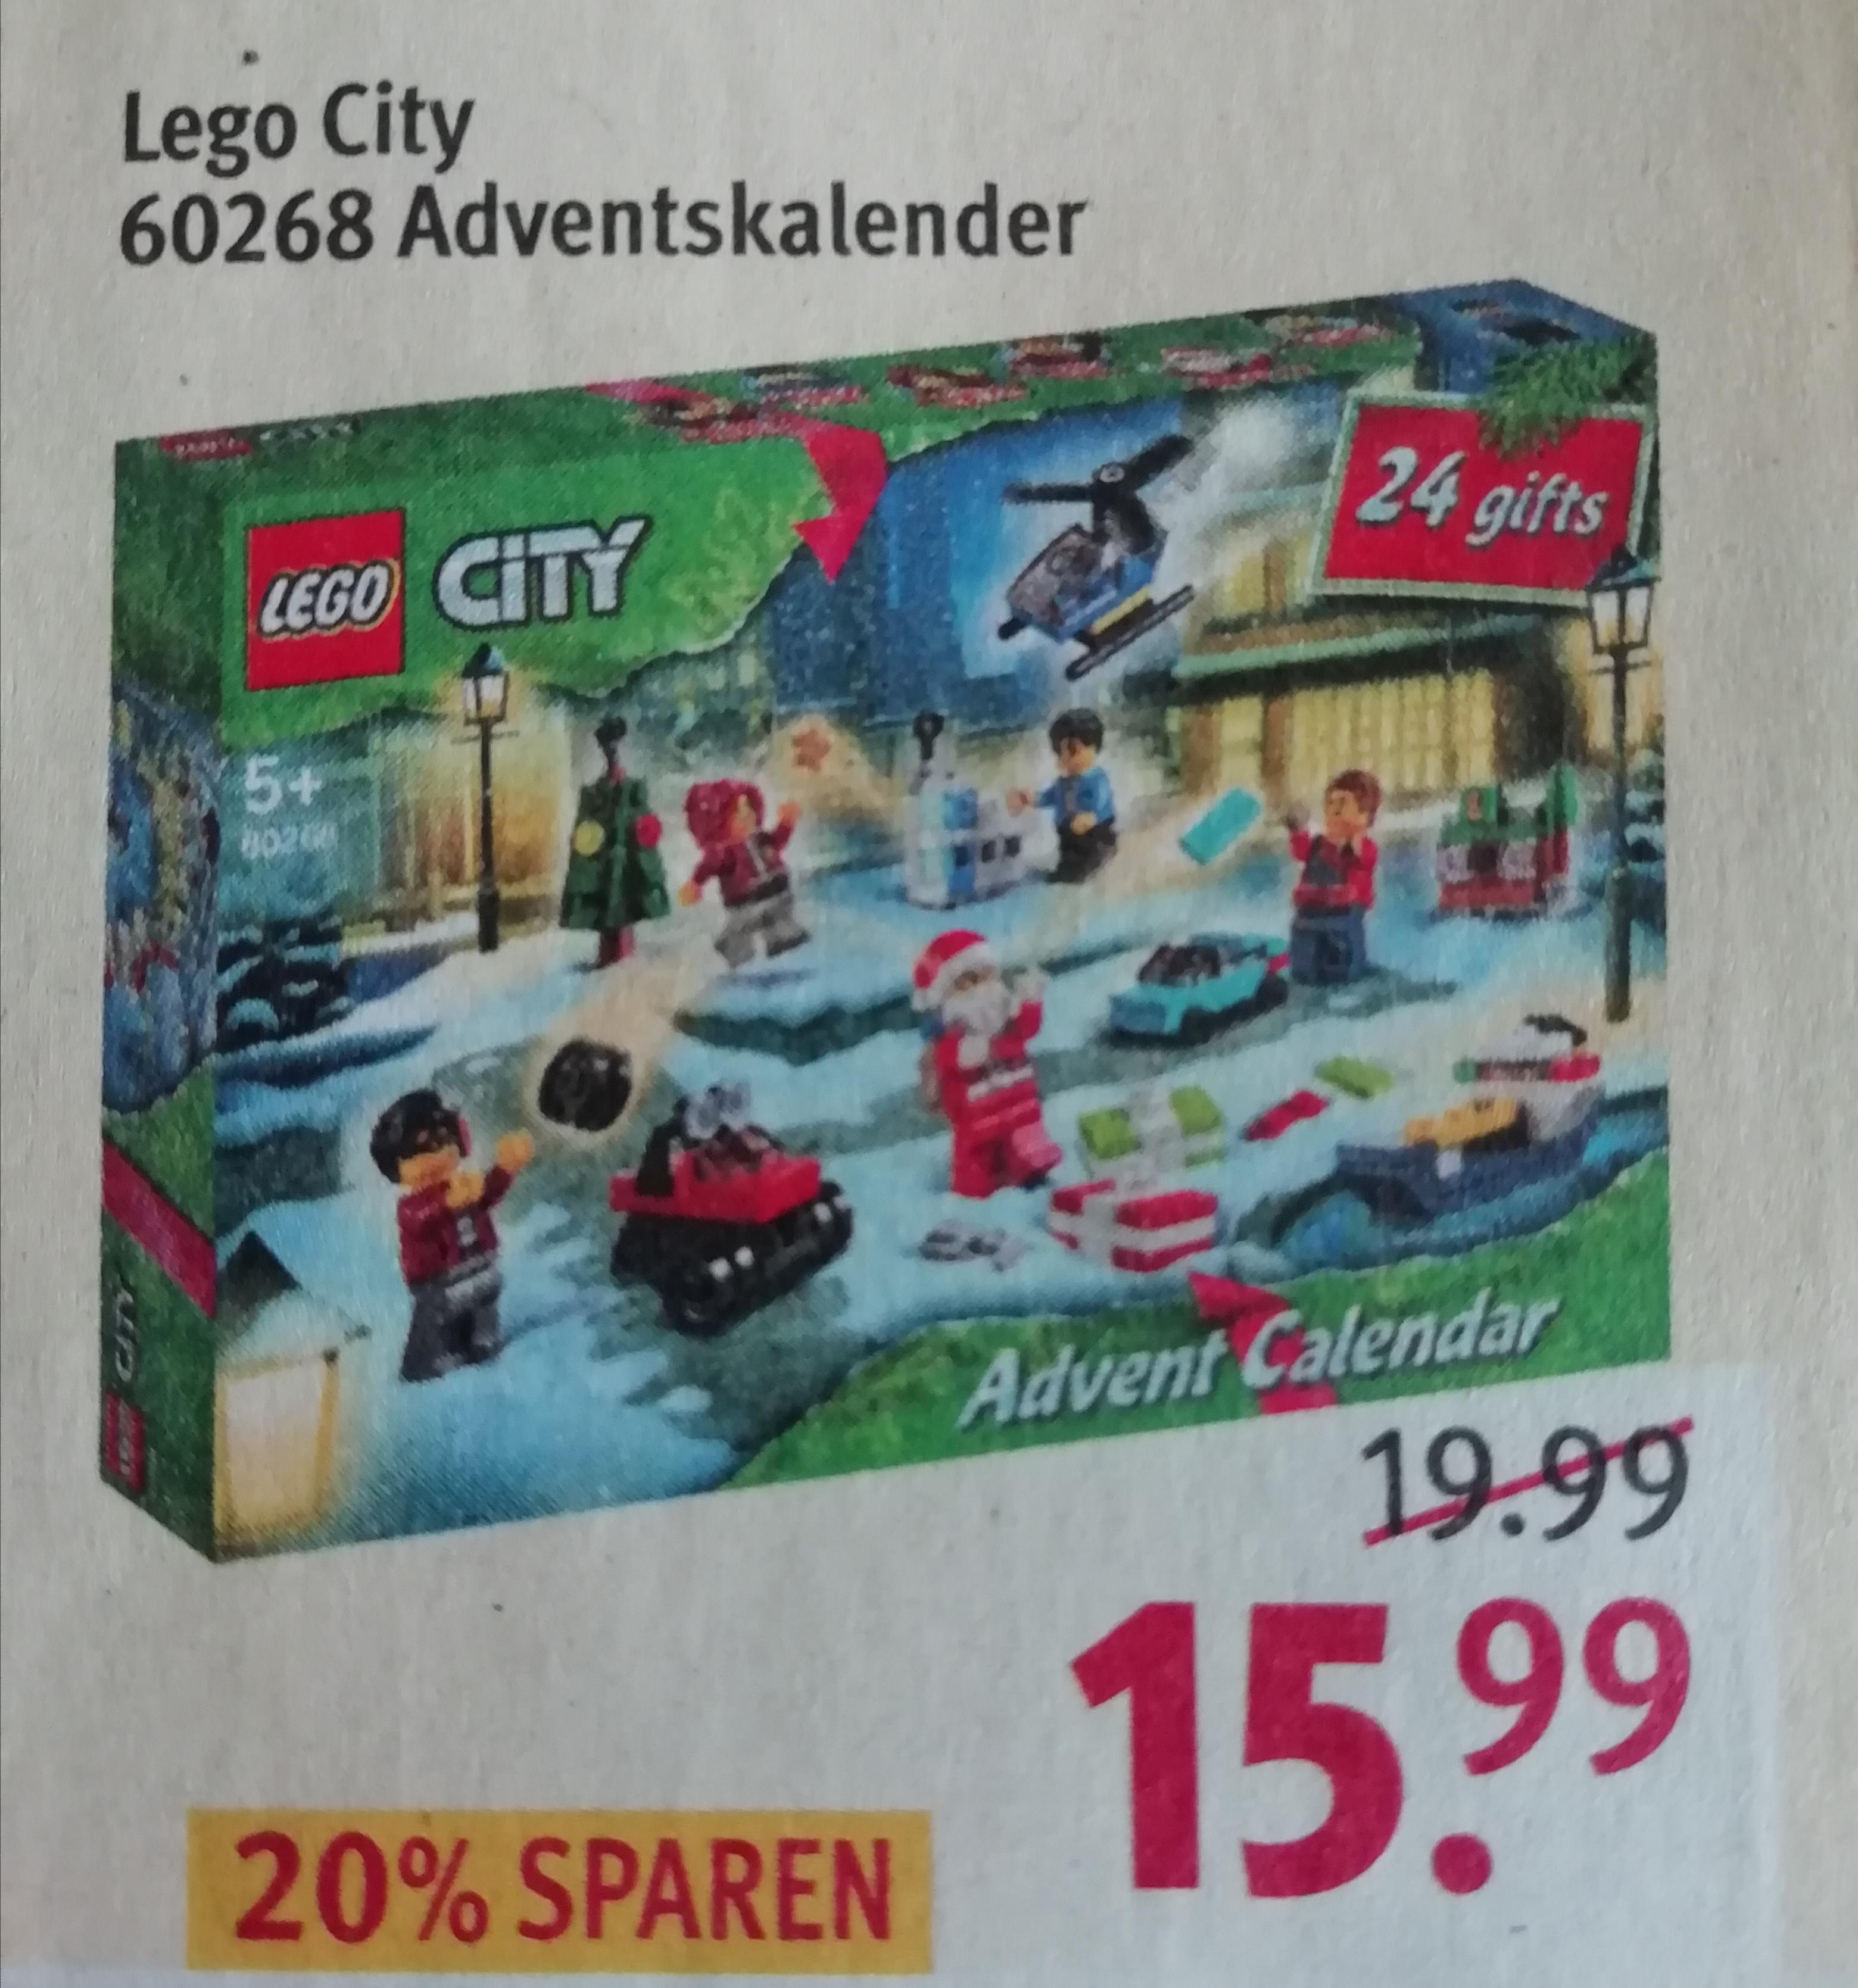 Lego City Adventskalender bei Rossmann mit 10% Coupon